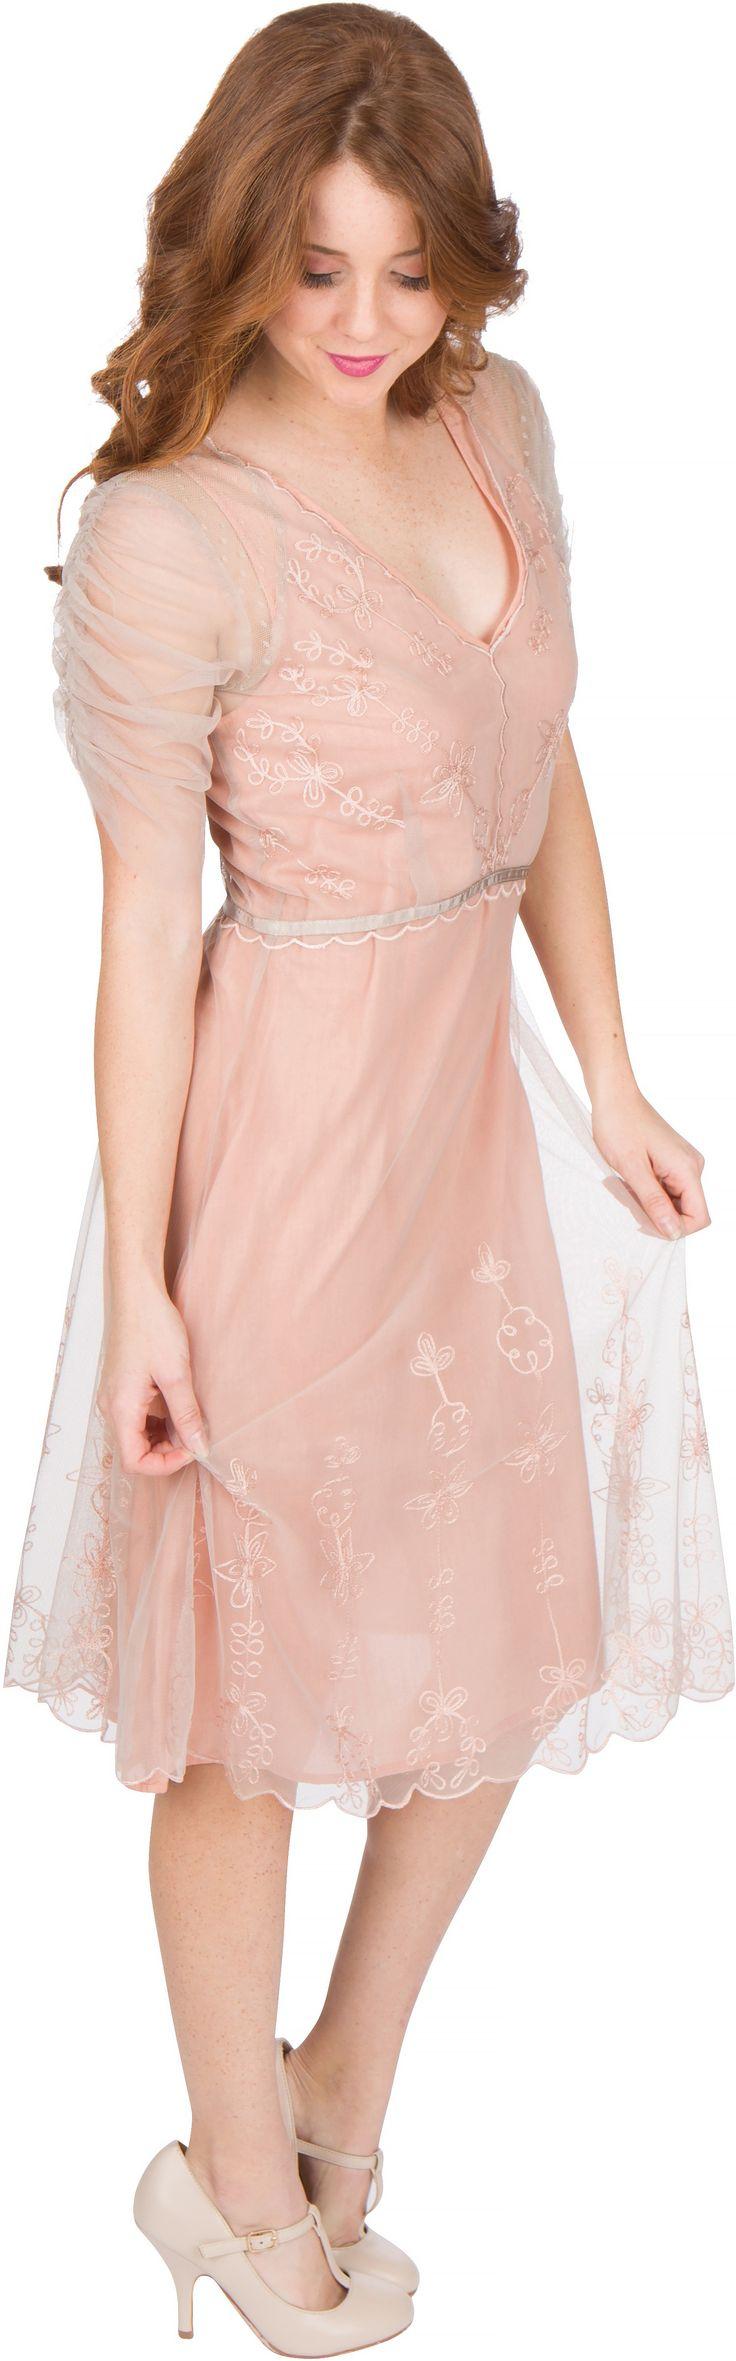 Al 251 Vintage Style Party Dress In Quartz By Nataya